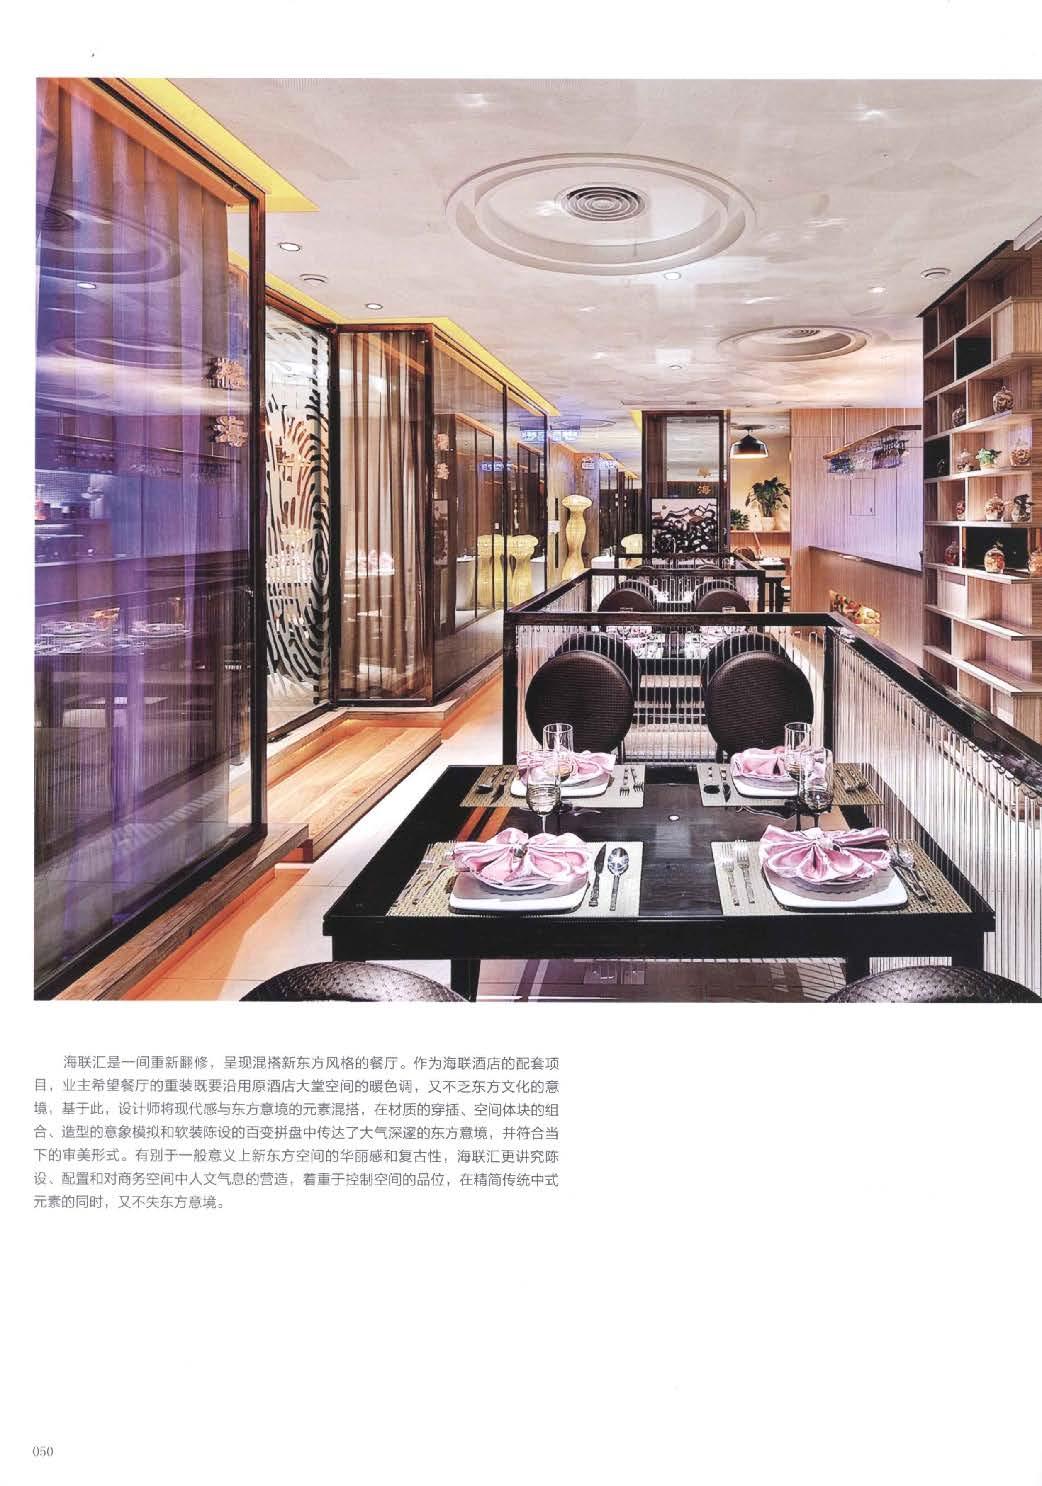 H073 东方风情 会所、餐饮细部解析_Page_048.jpg